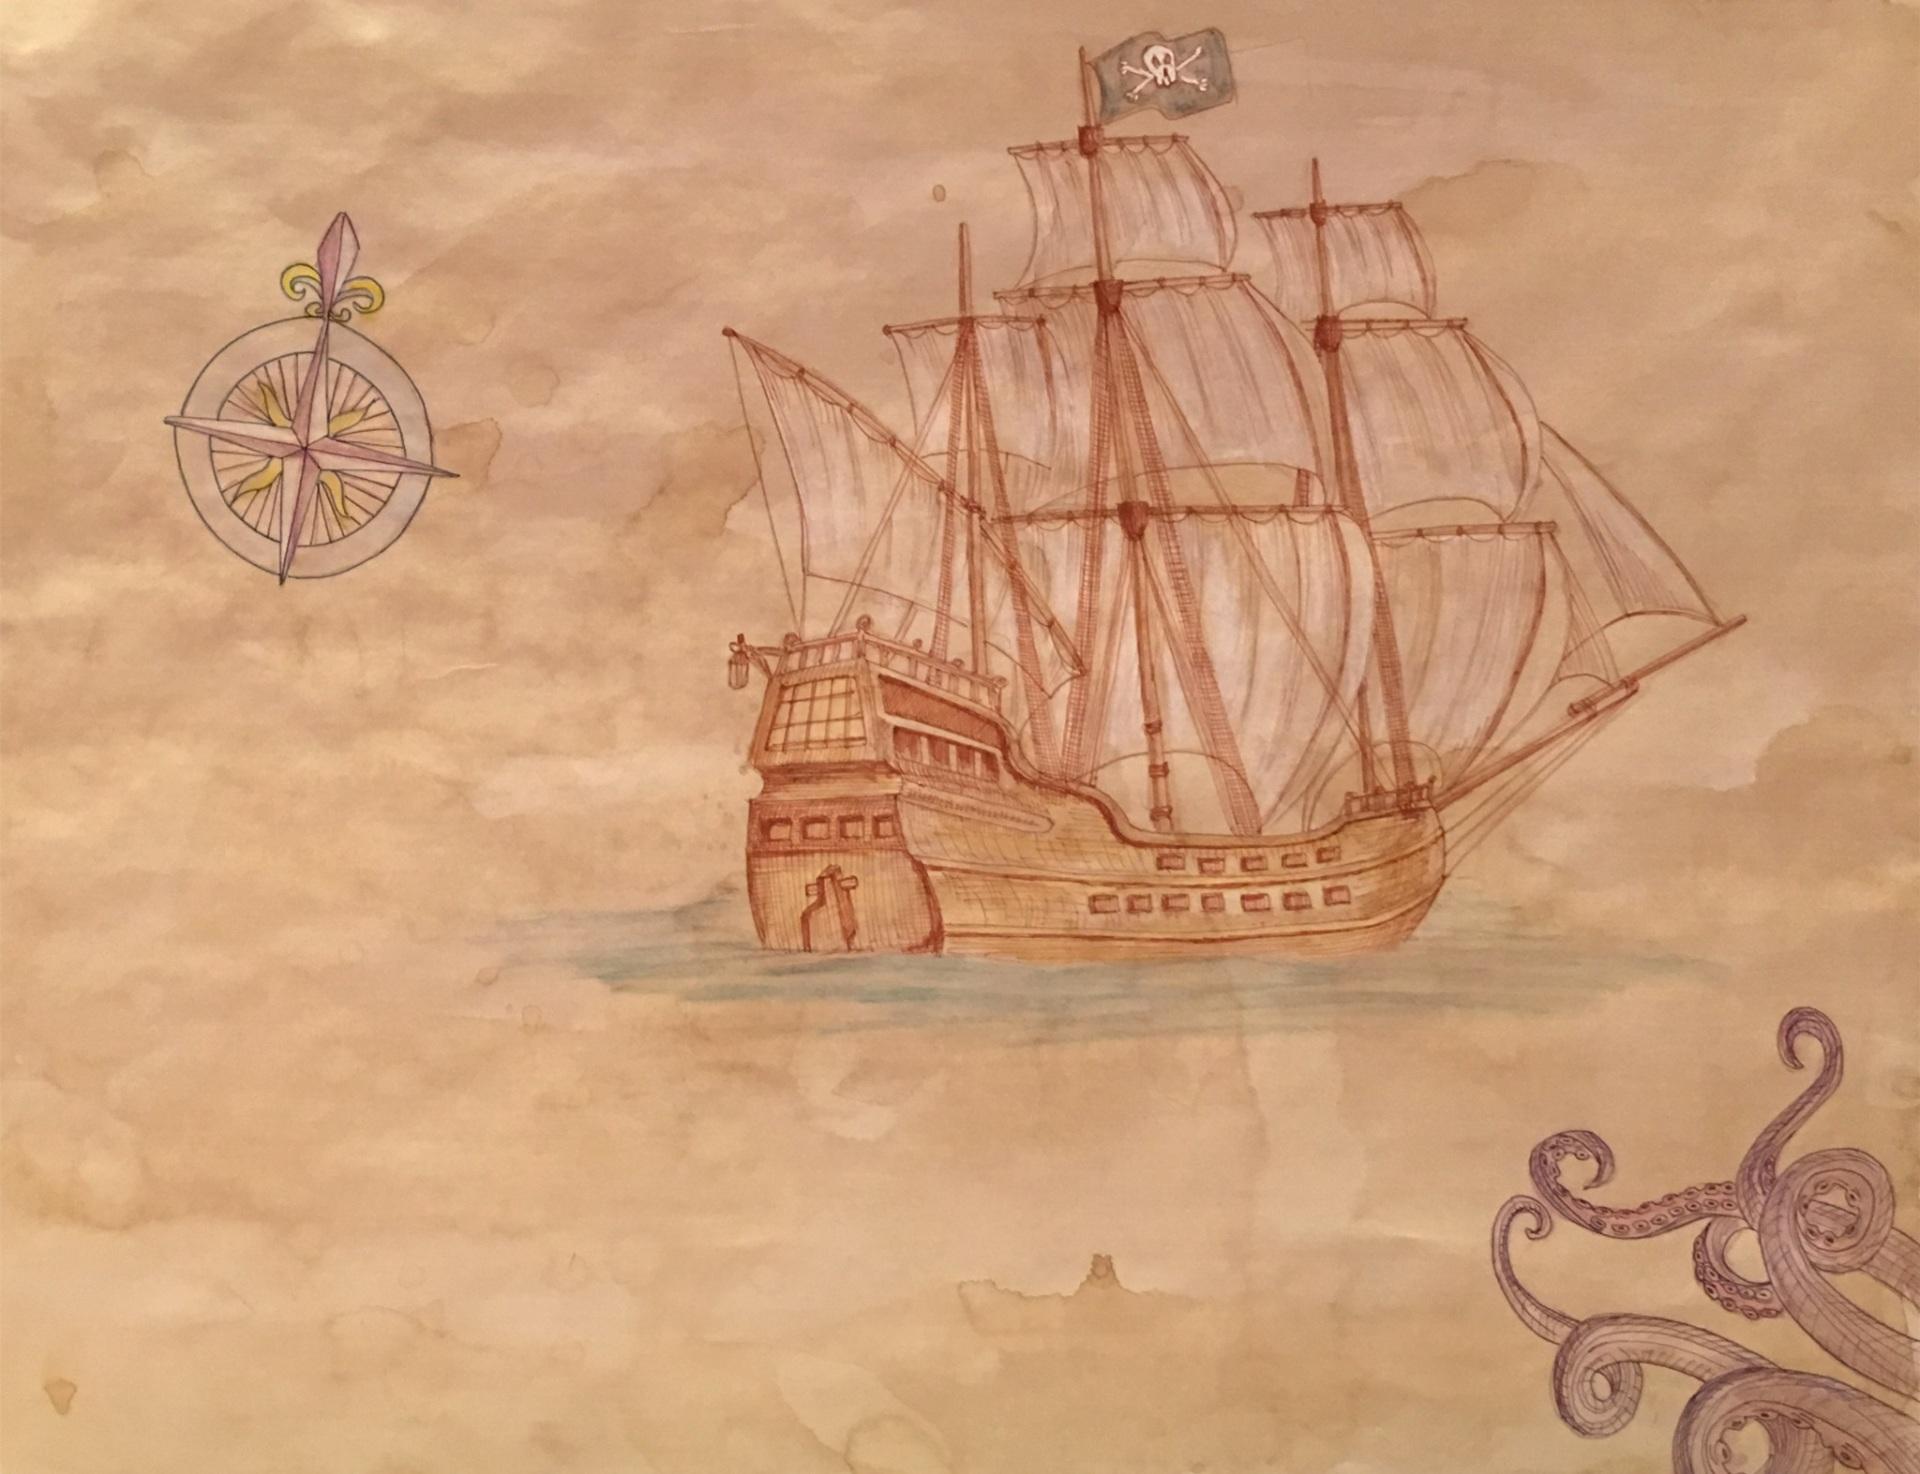 marina manzano, illustration, drawing, ilustración, il·lustració, apic, cuquetafera